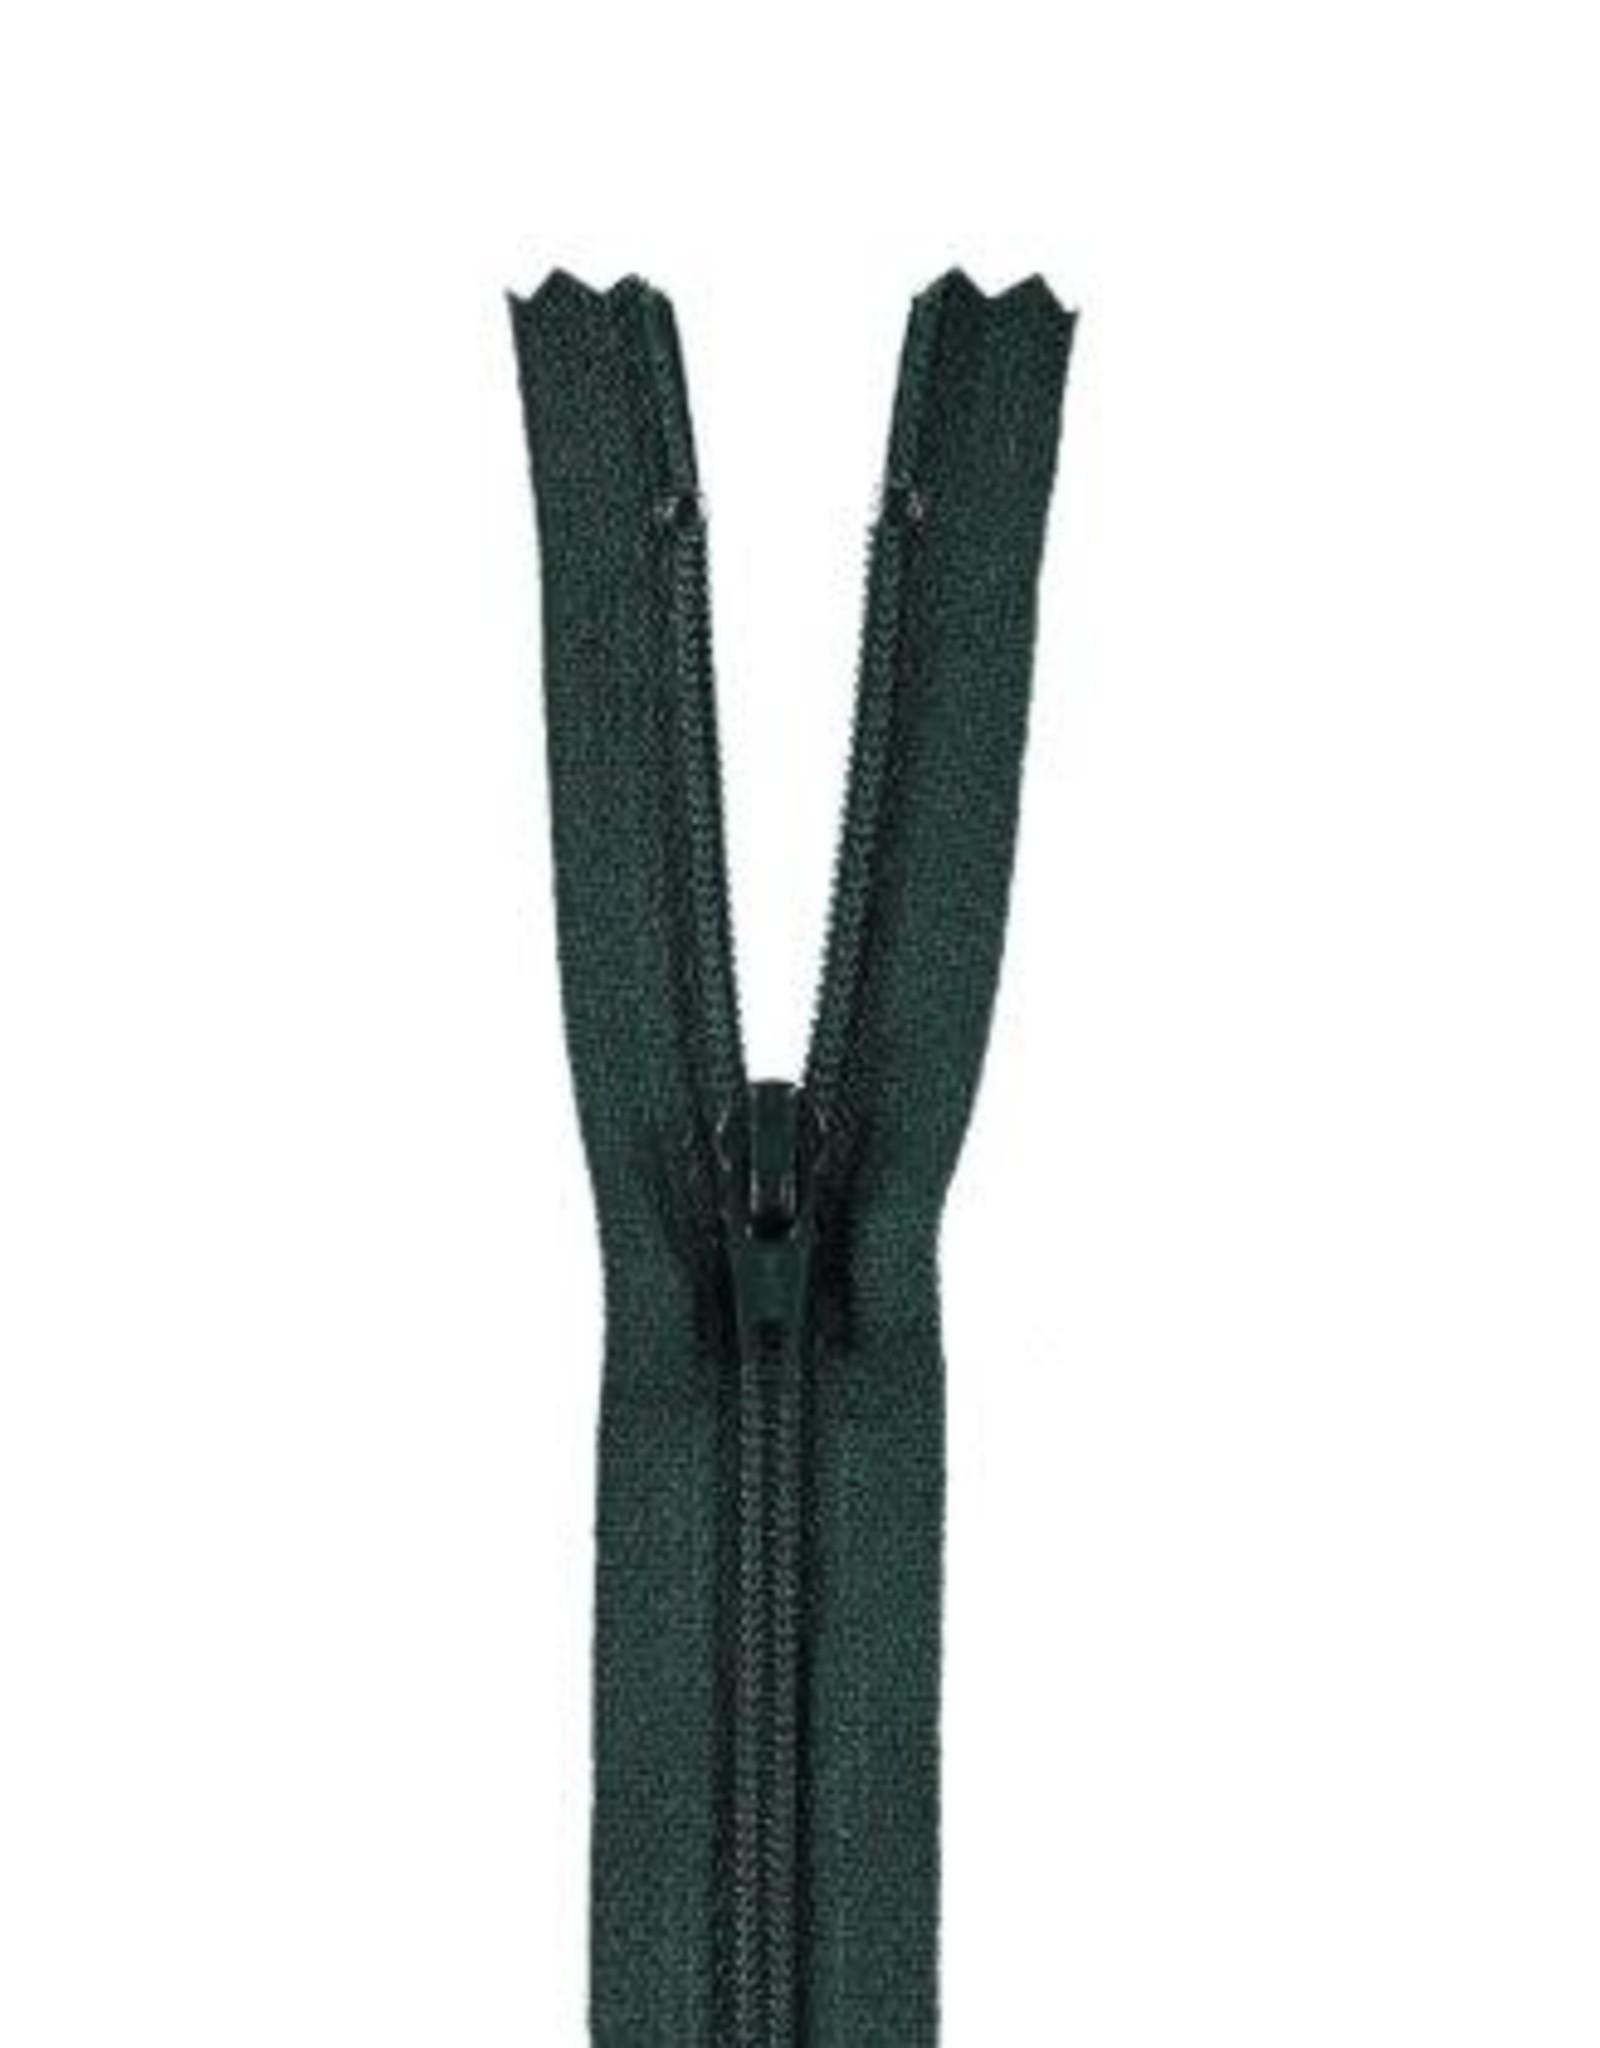 YKK Spiraalrits niet-DB 3mm donker groen 890-35cm